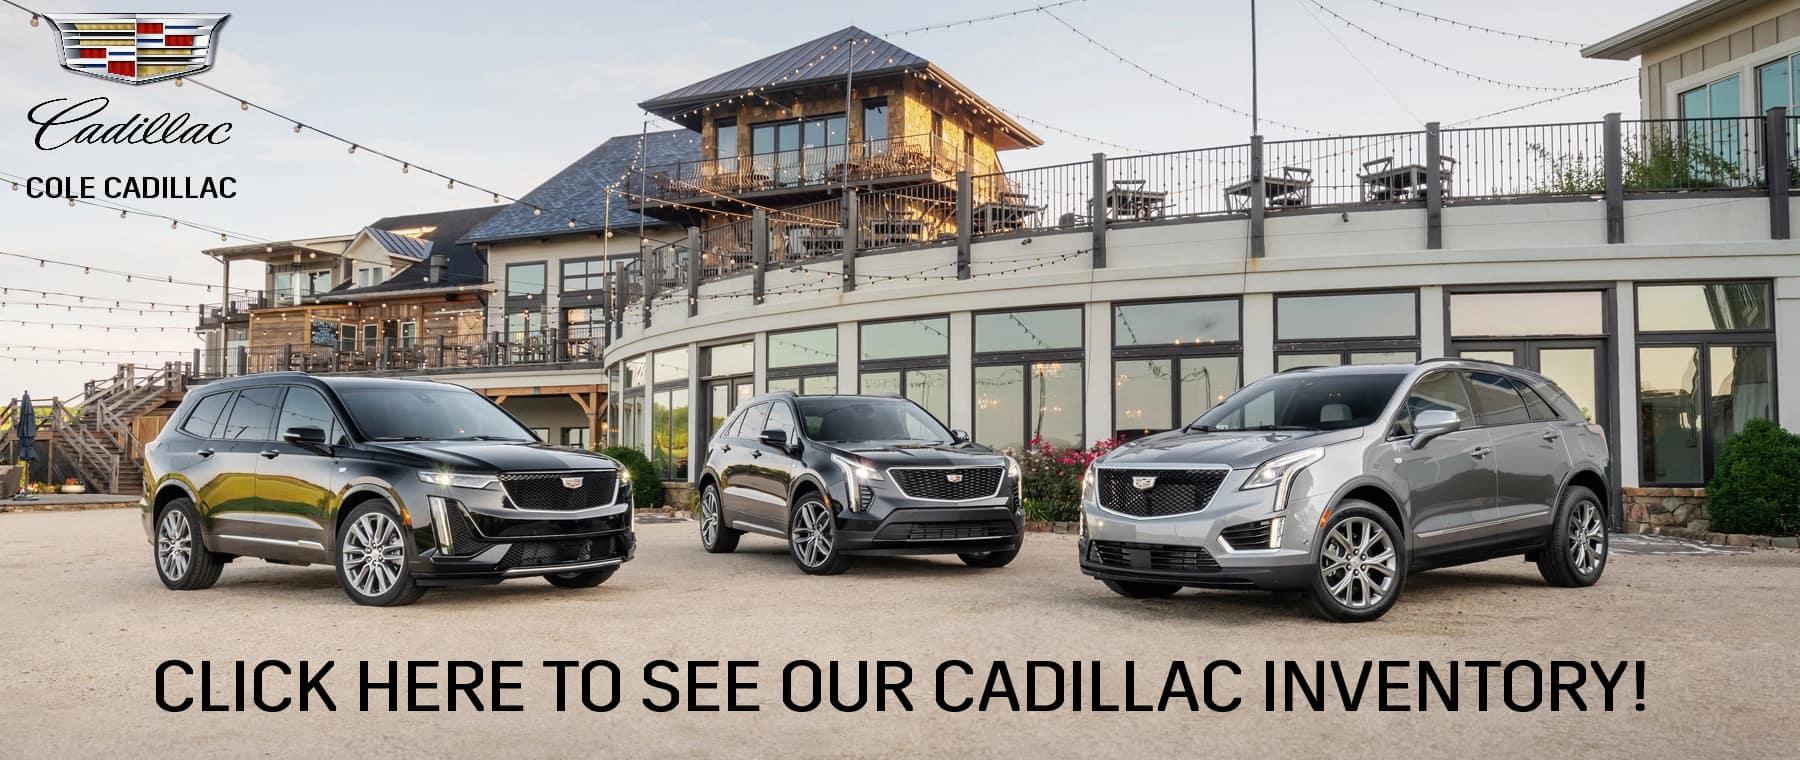 Cole Cadillac Inventory